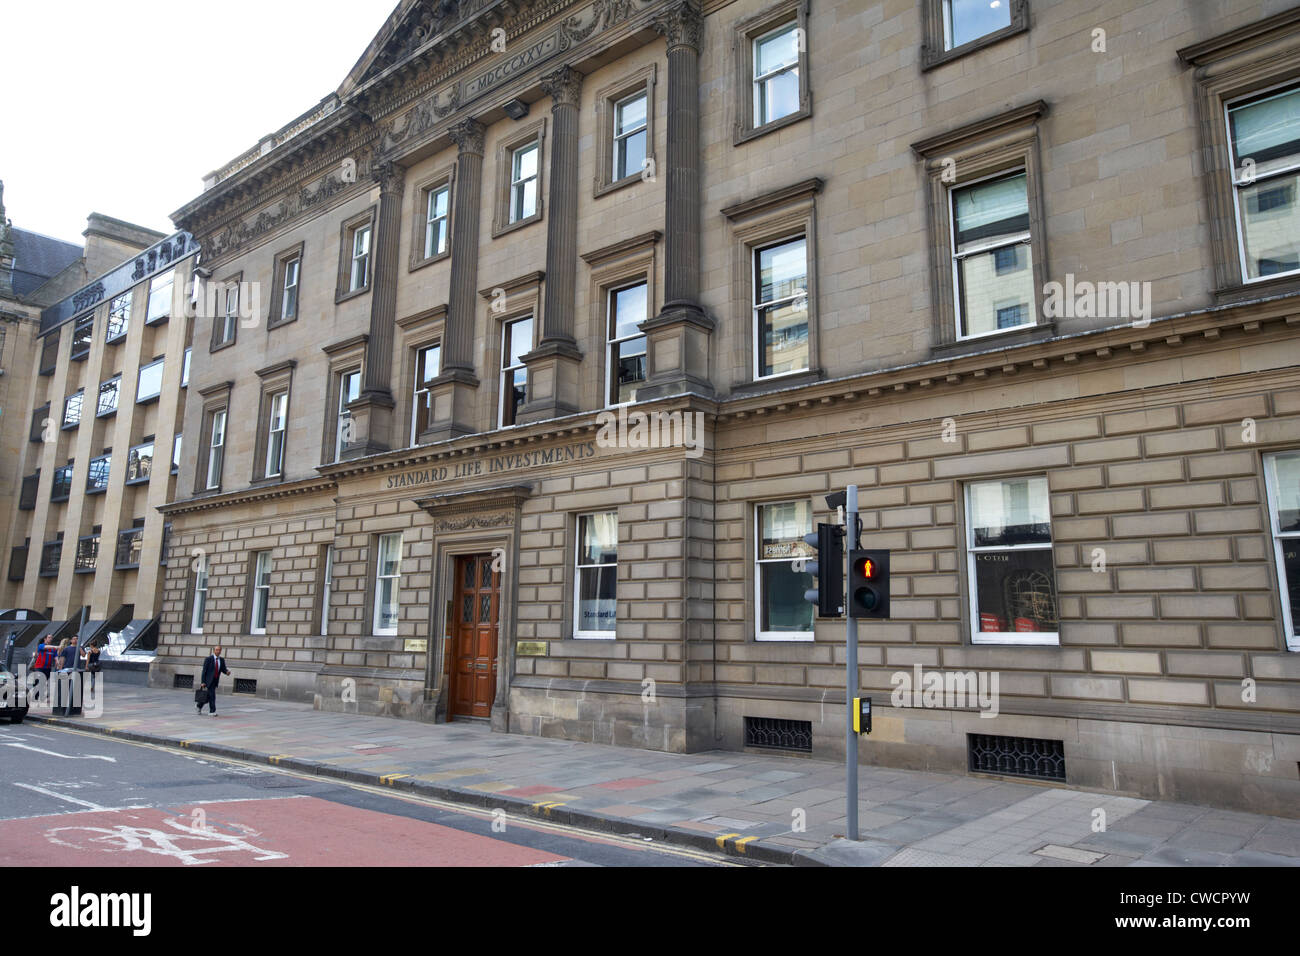 standard life investments building 1 george street edinburgh scotland uk united kingdom - Stock Image